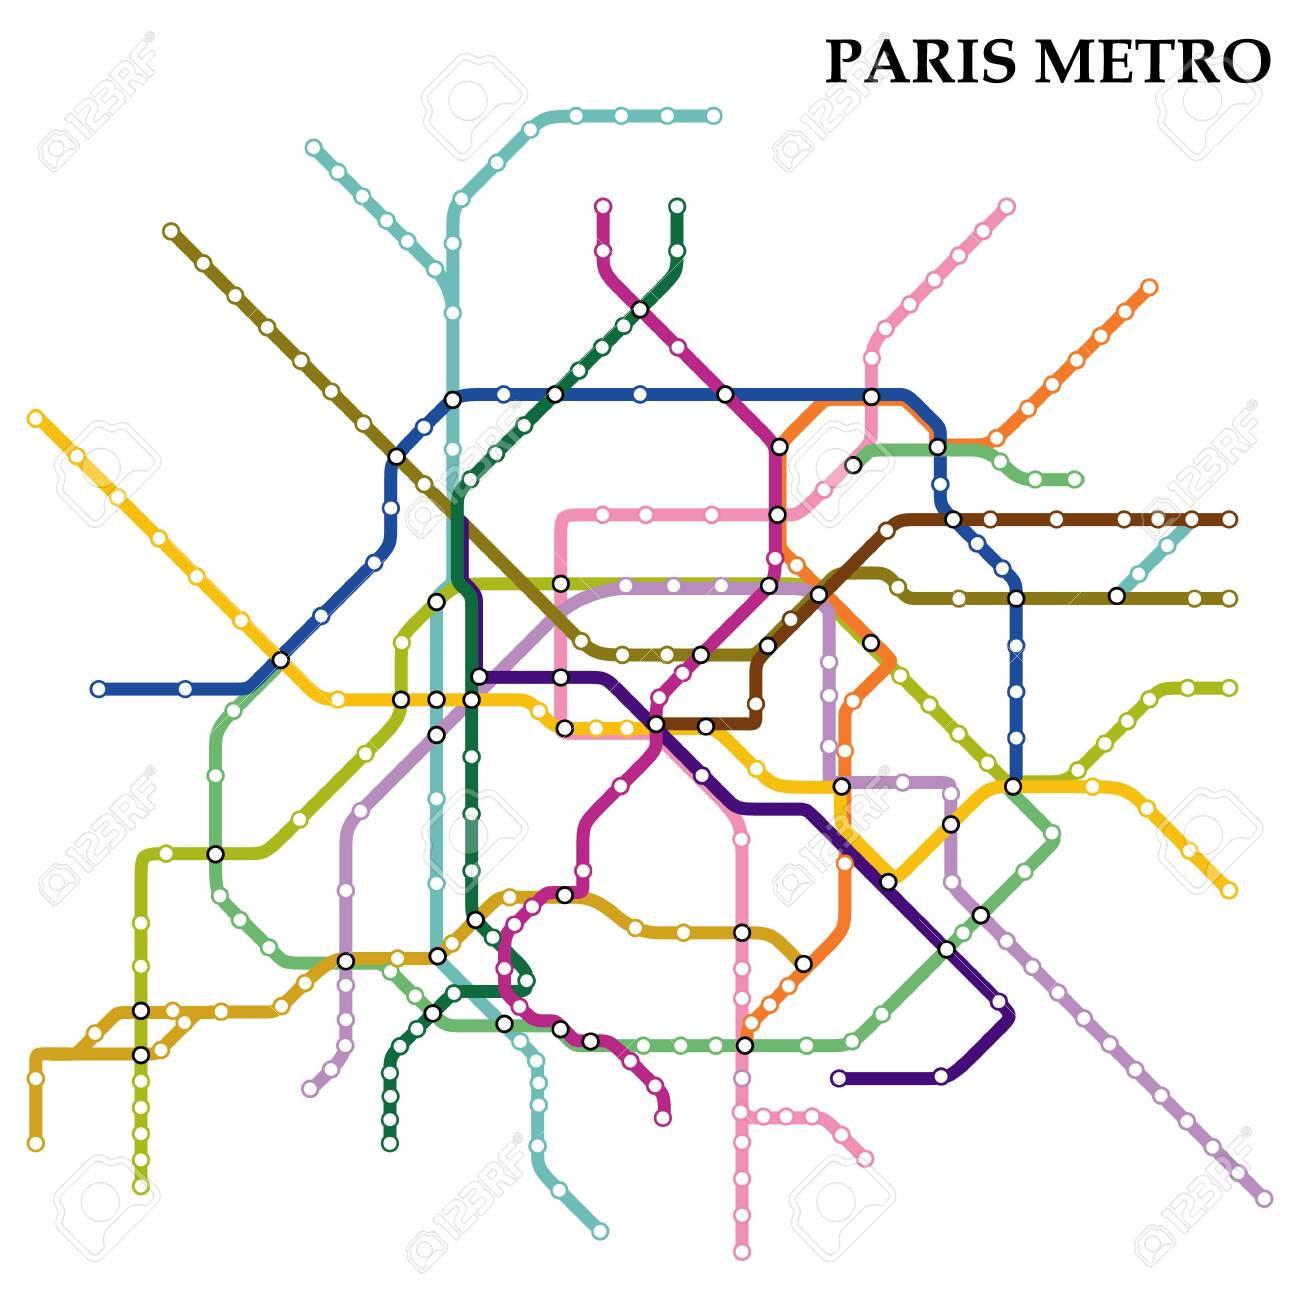 Map Subway Paris.Map Of The Paris Metro Subway Template Of City Transportation Royalty Free Cliparts Vectors And Stock Illustration Image 125913575